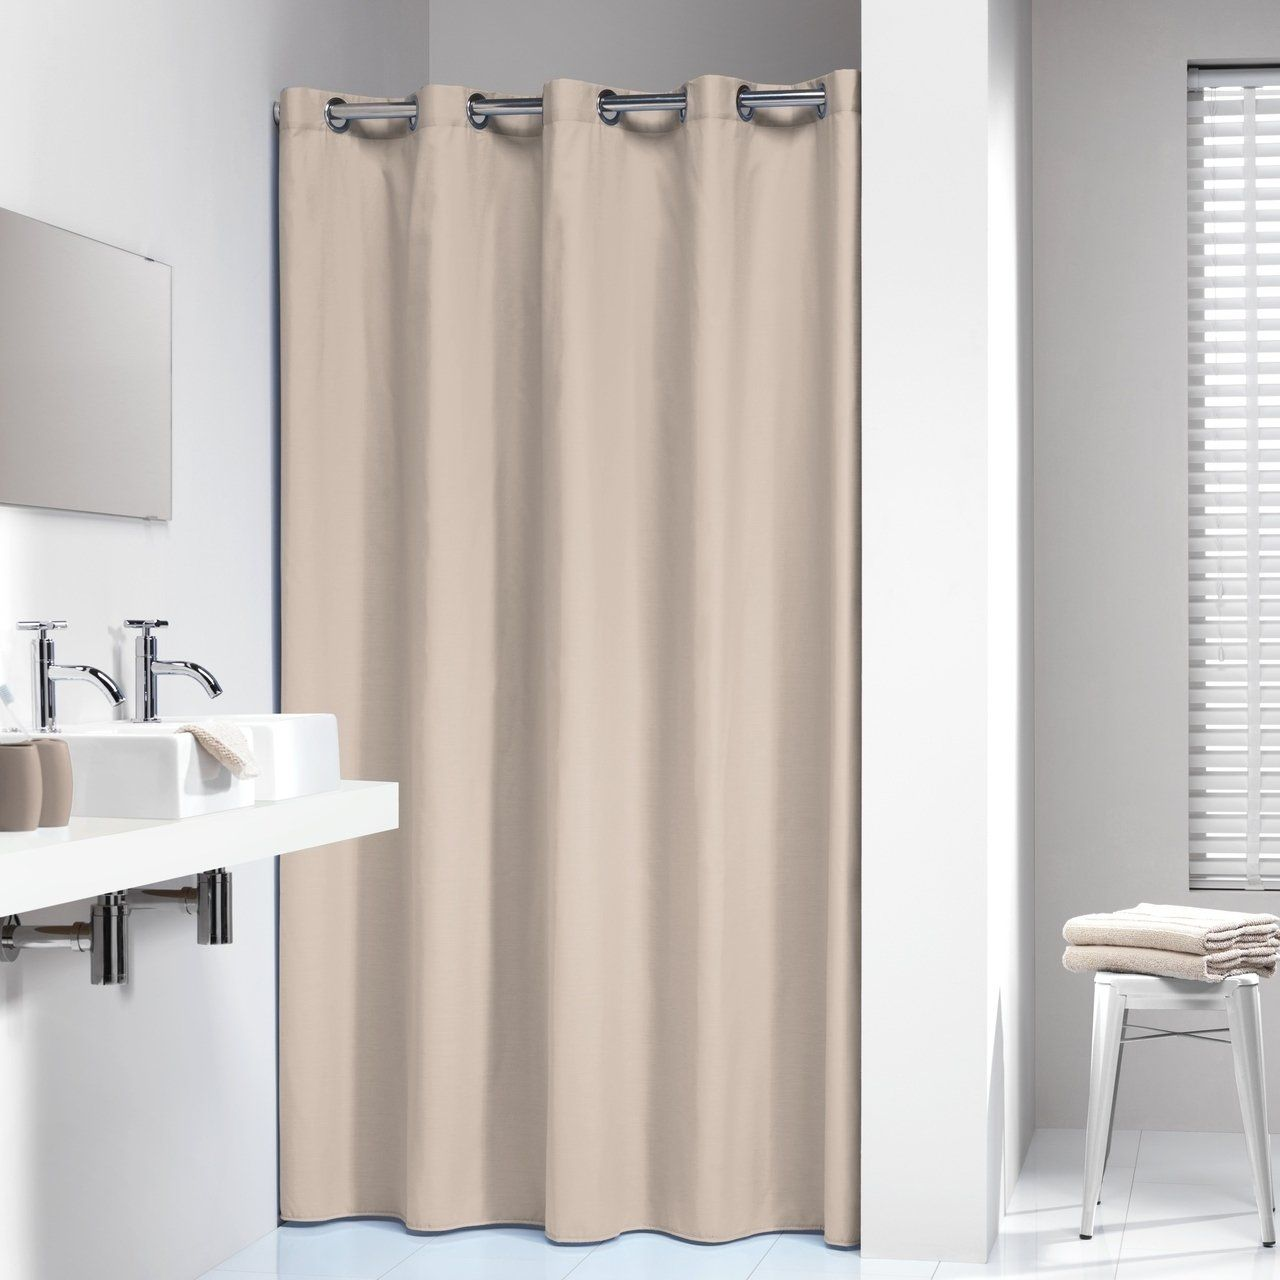 Sealskin Extra Long Hookless Shower Curtain 78 X 72 Inch Coloris Beige Cotton Brown Modern Shower Curtains Hookless Shower Curtain Long Shower Curtains